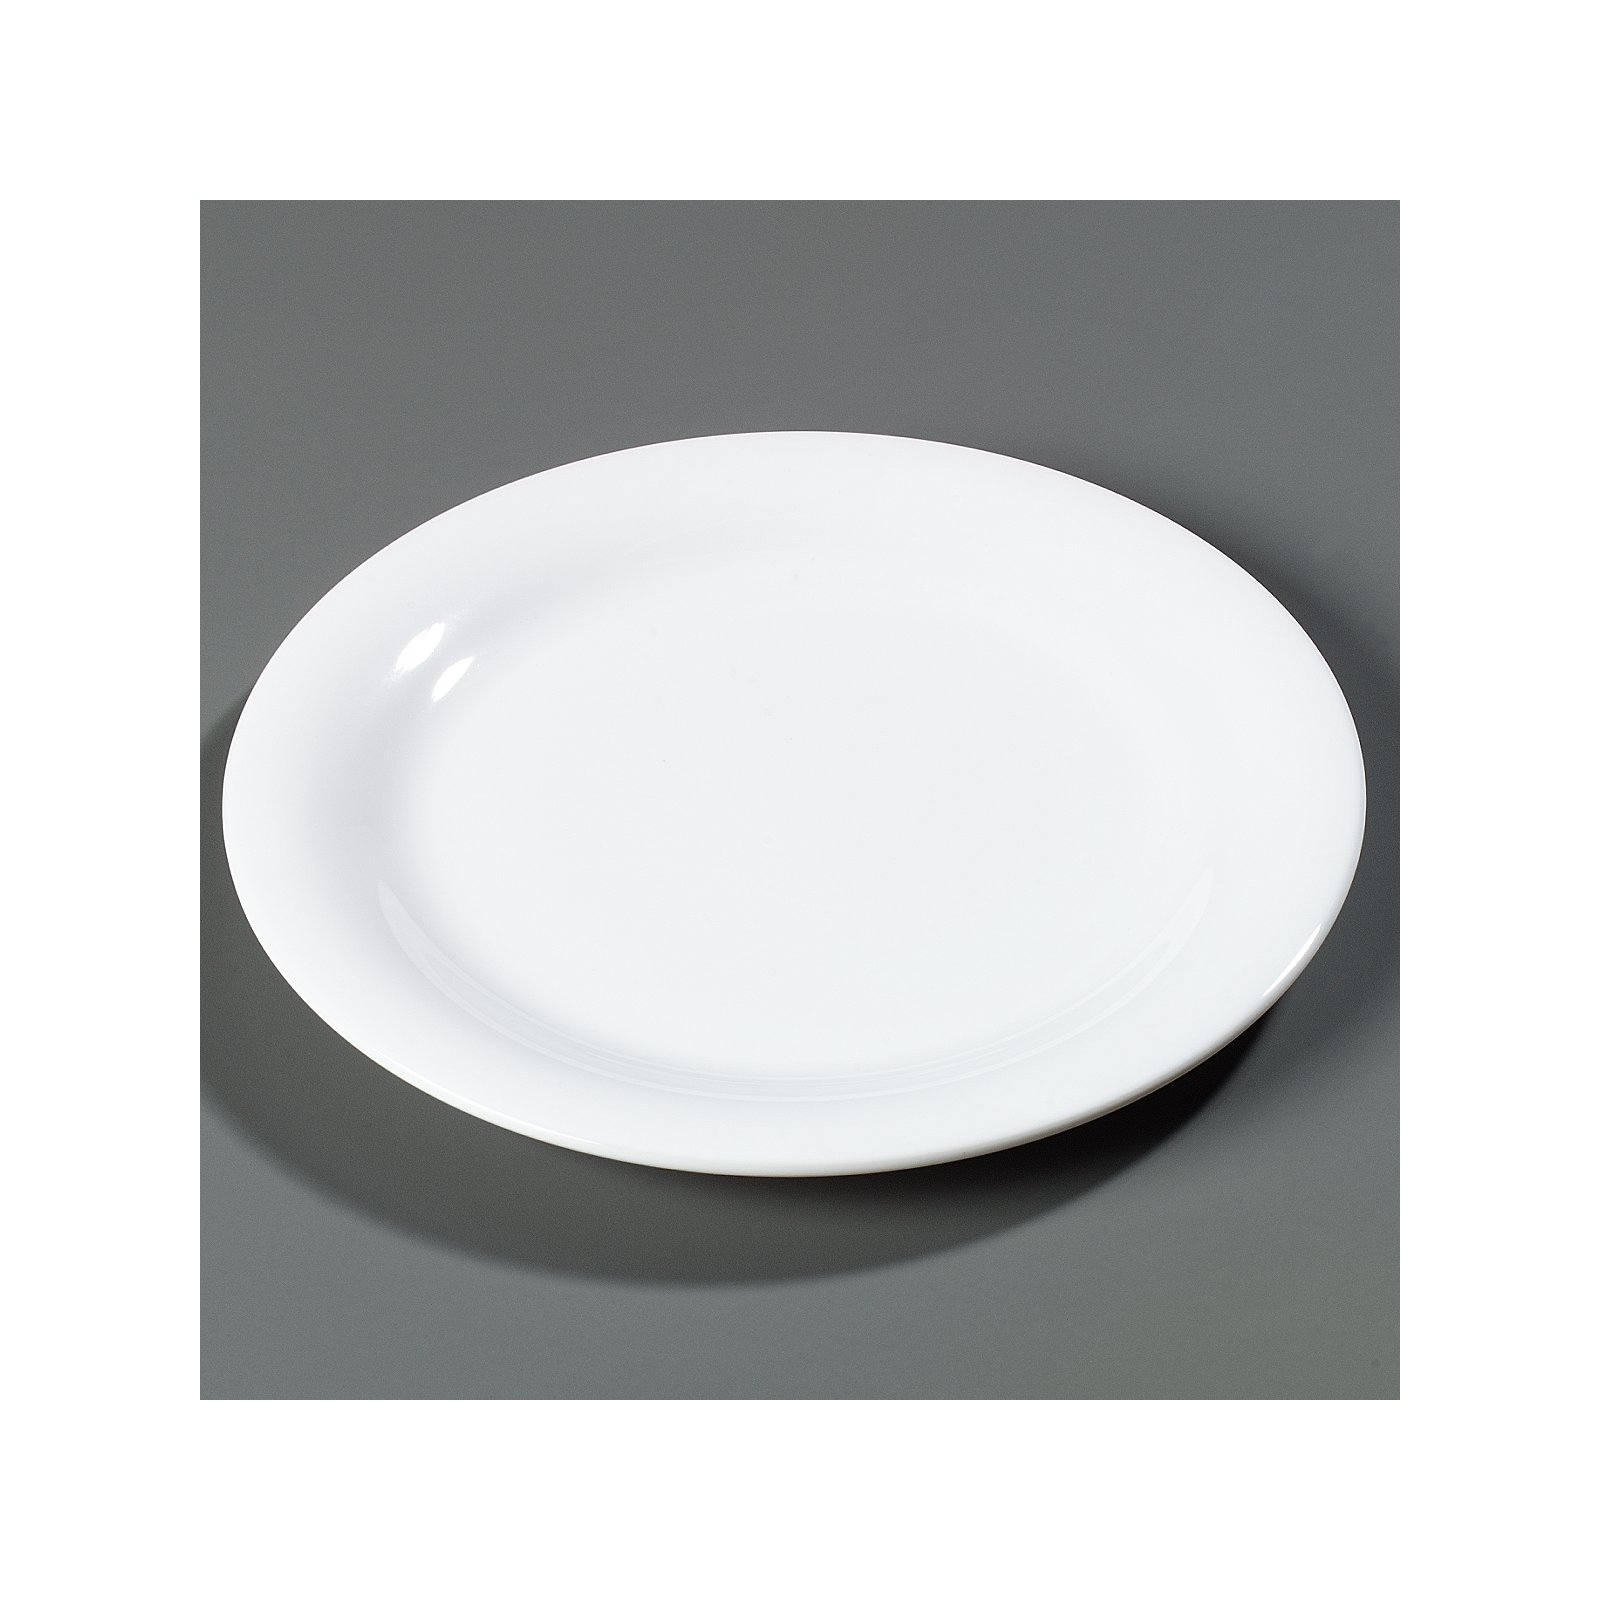 ... 3300402 - Sierrus™ Melamine Narrow Rim Dinner Plate 9\  - White  sc 1 st  Carlisle FoodService Products & 3300402 - Sierrus™ Melamine Narrow Rim Dinner Plate 9\